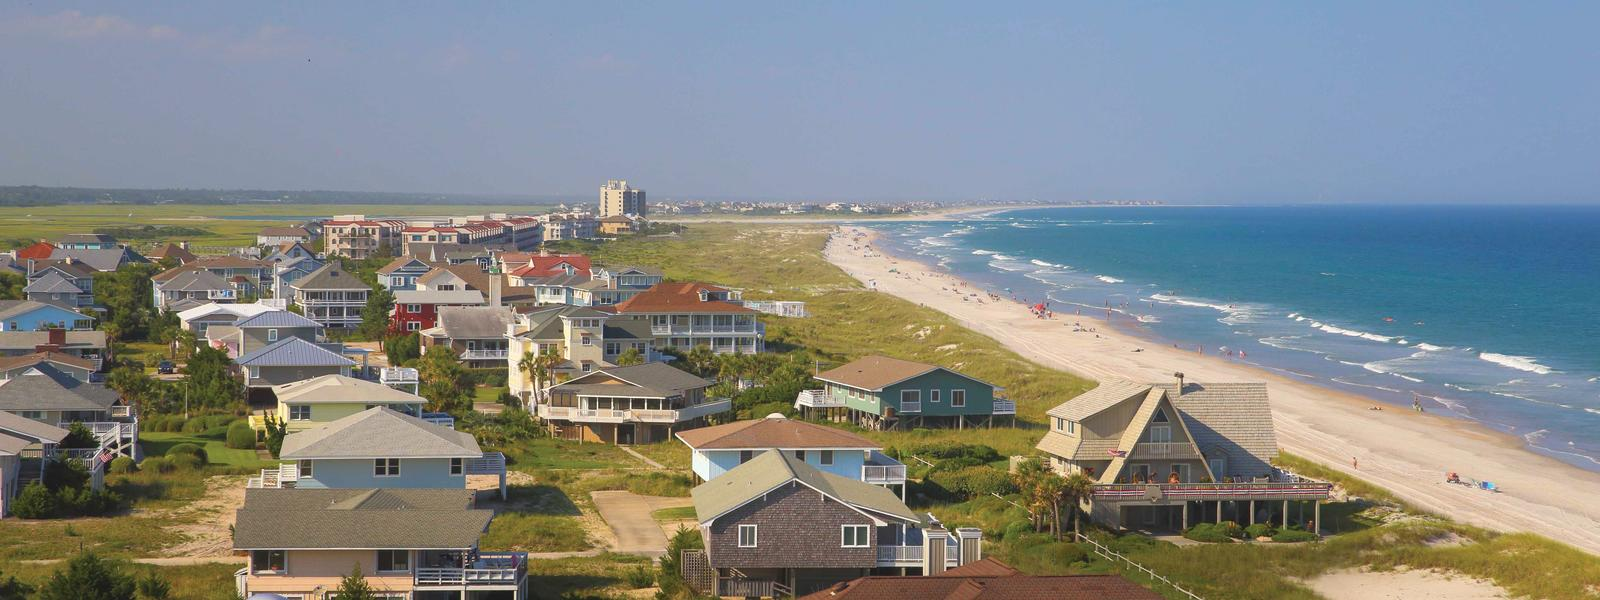 Wilmington Area Live Beach Webcams Wilmington Amp Beaches